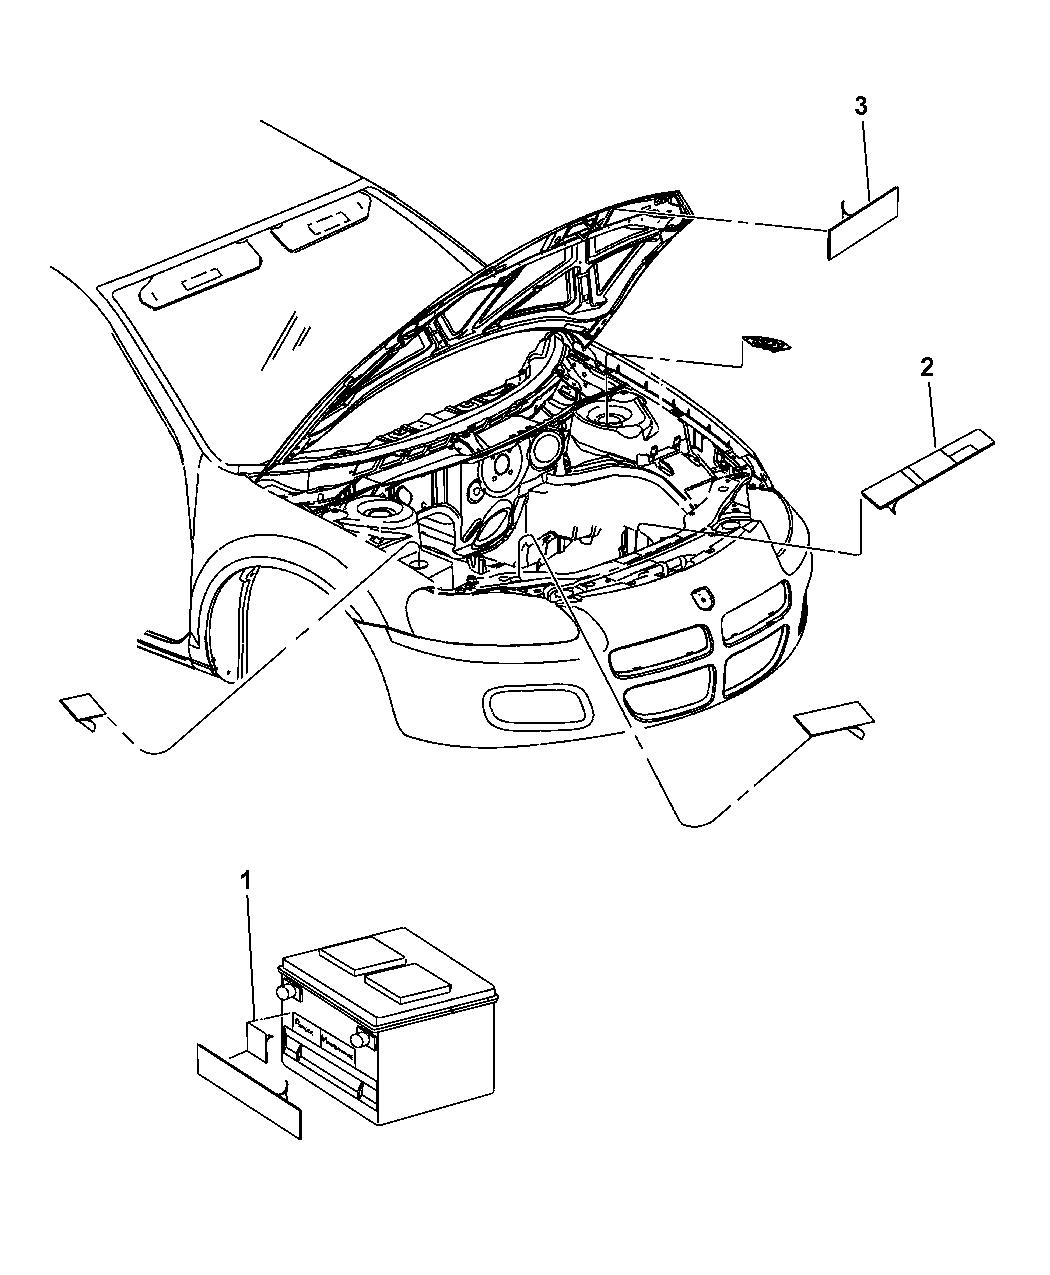 Chrysler Sebring Engine Compartment